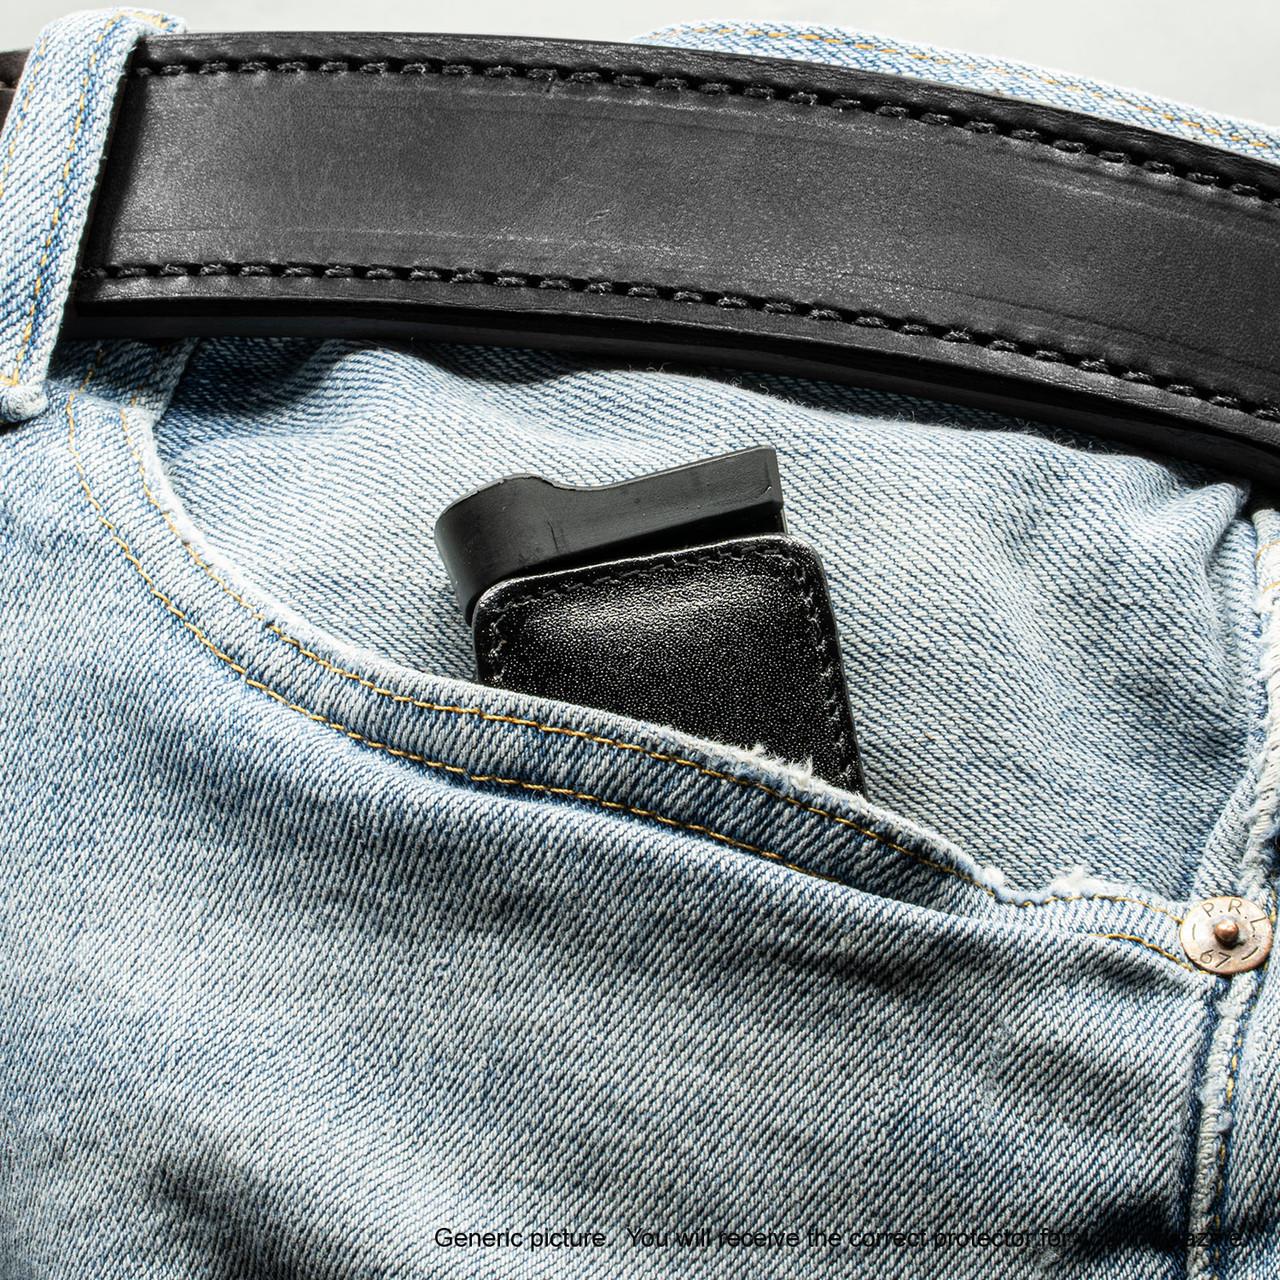 Taurus G2S Black Leather Magazine Pocket Protector